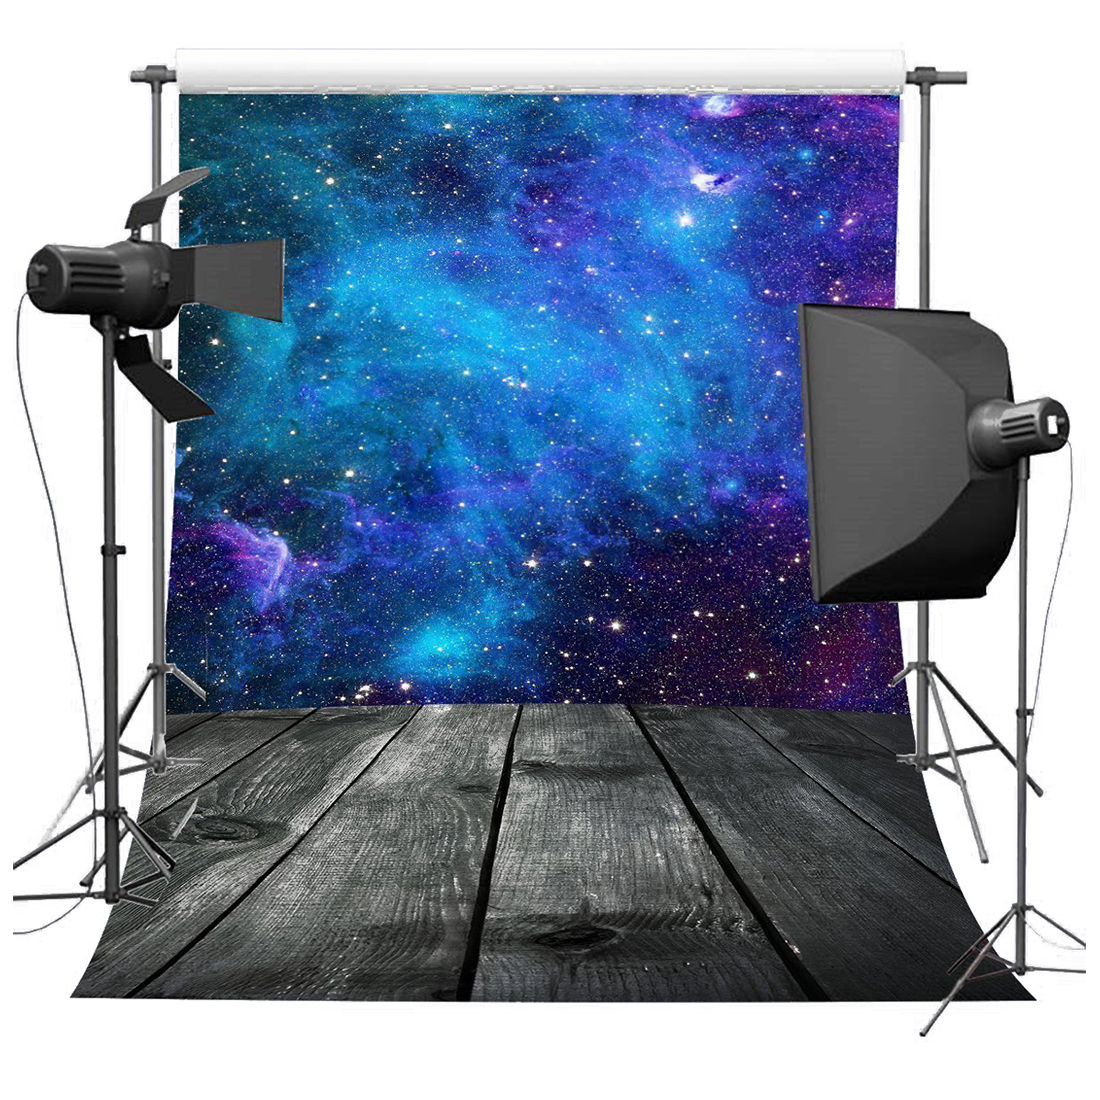 5X7ft Gorgeous Blue Starry Sky Photography Backdrops For Children Portrait Shooting Props blue sky чаша северный олень